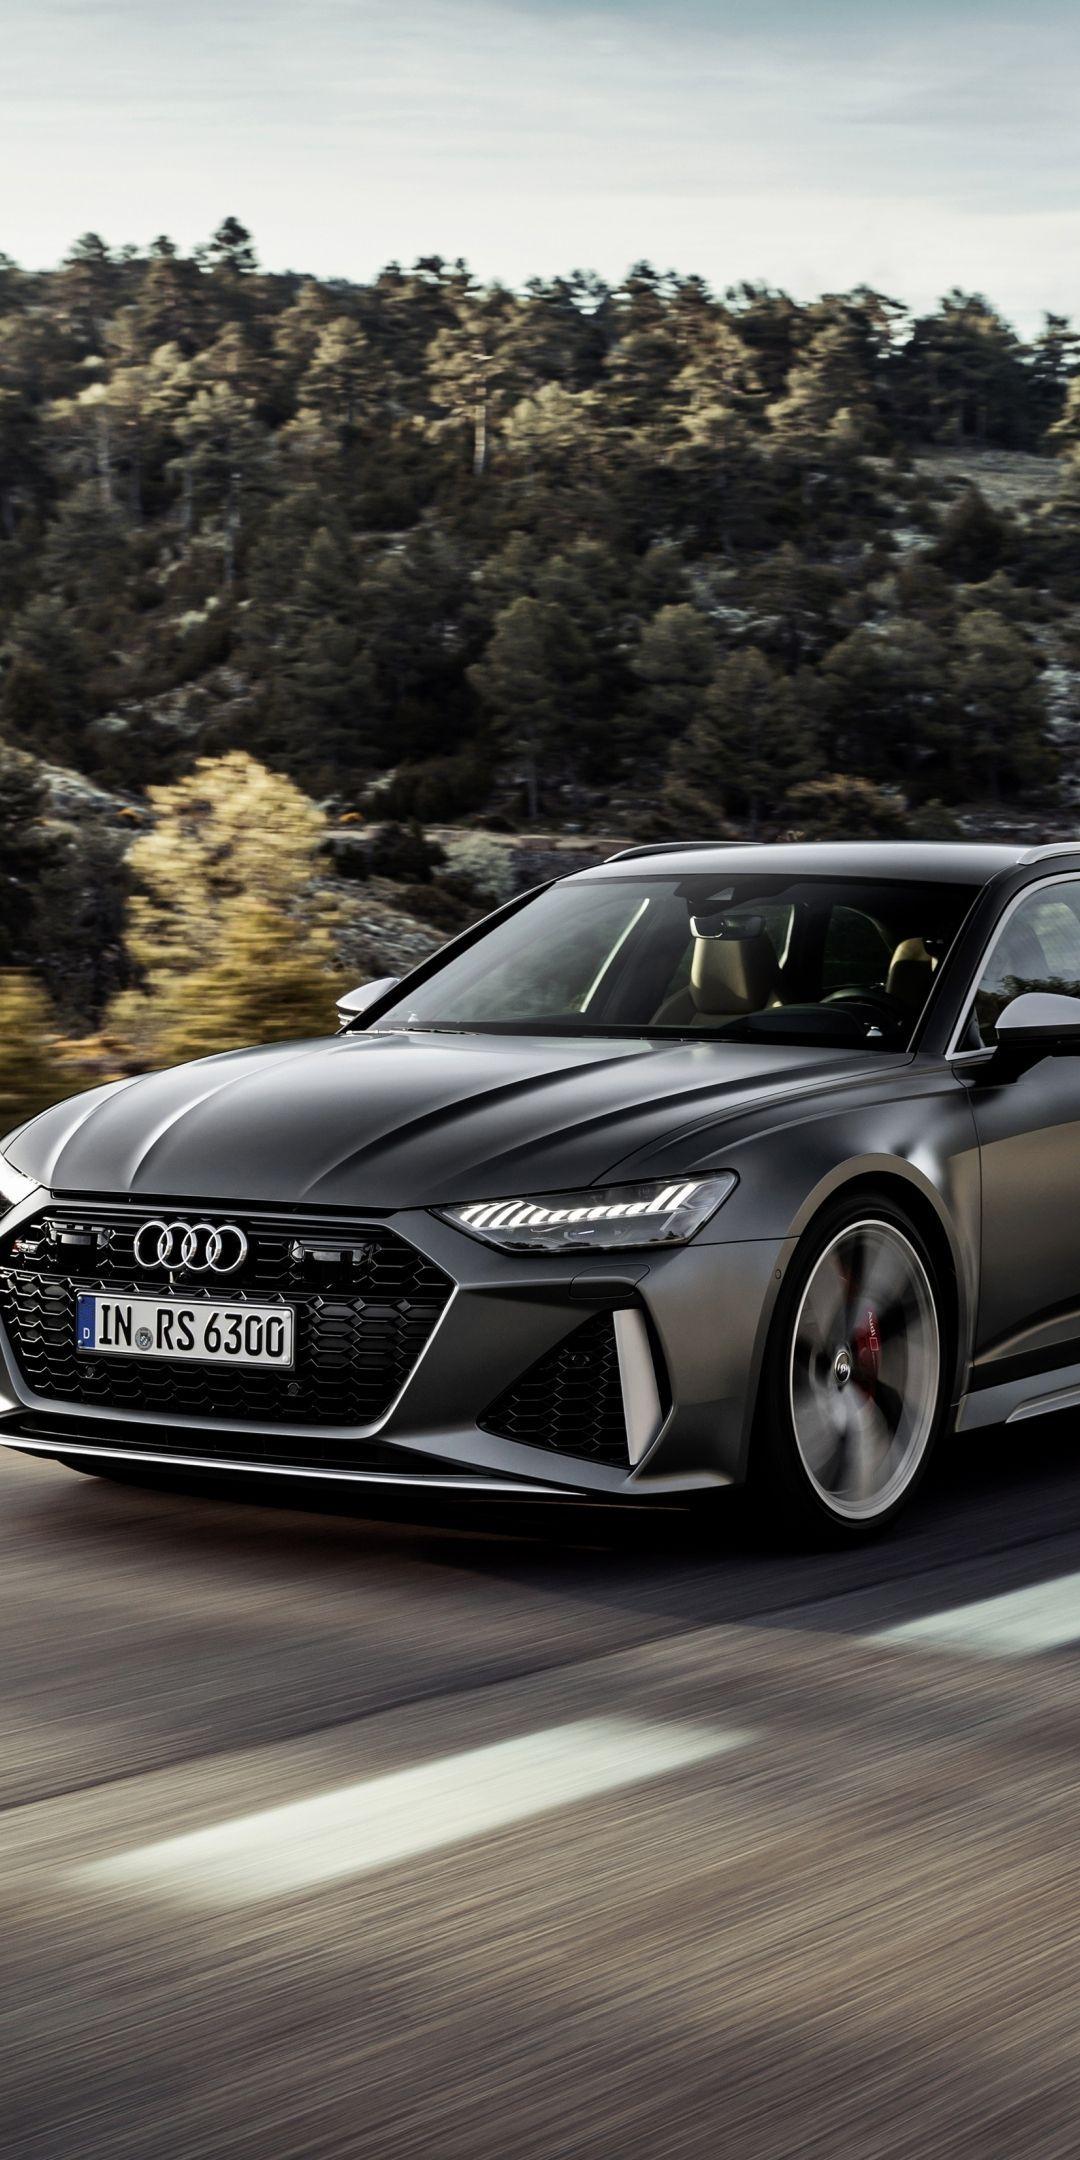 2020 Audi Rs6 Avant Black Car 1080x2160 Wallpaper Black Car Wallpaper Black Audi Audi Rs6